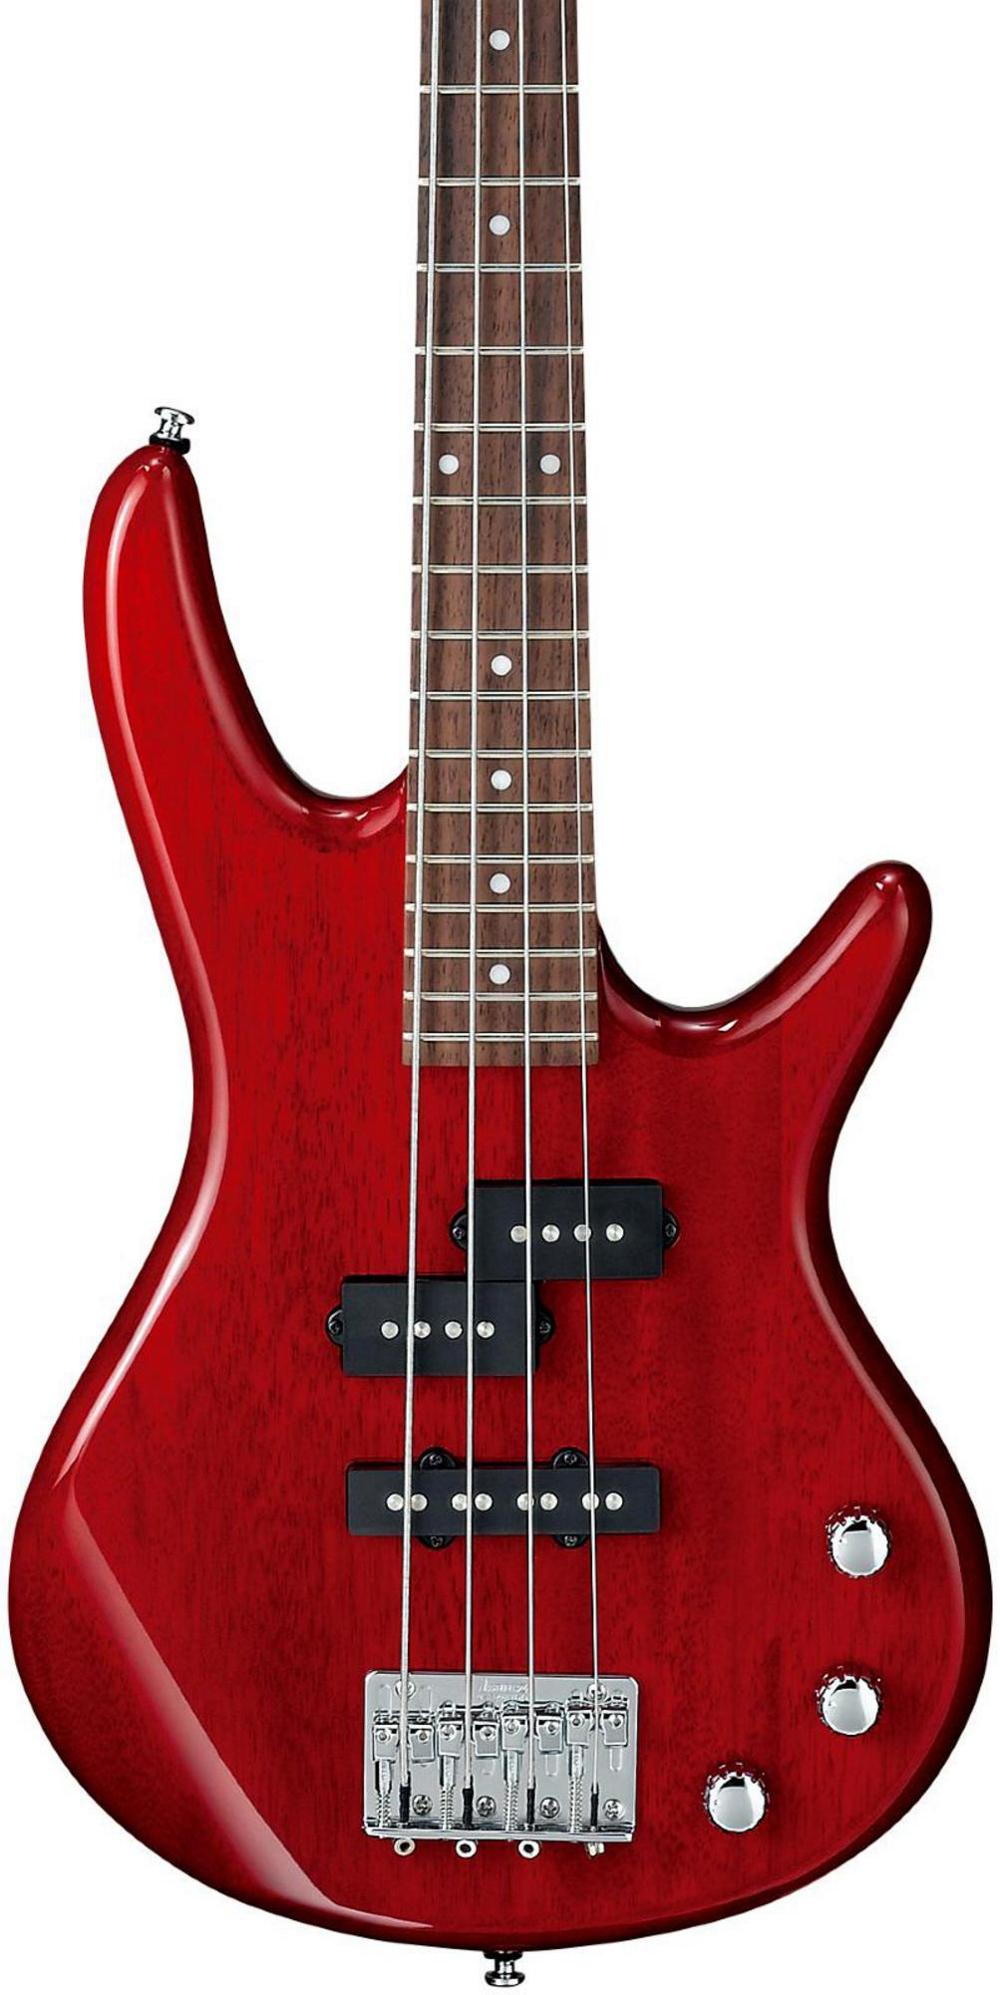 ibanez gsrm20 mikro short scale bass guitar transparent red rosewood. Black Bedroom Furniture Sets. Home Design Ideas